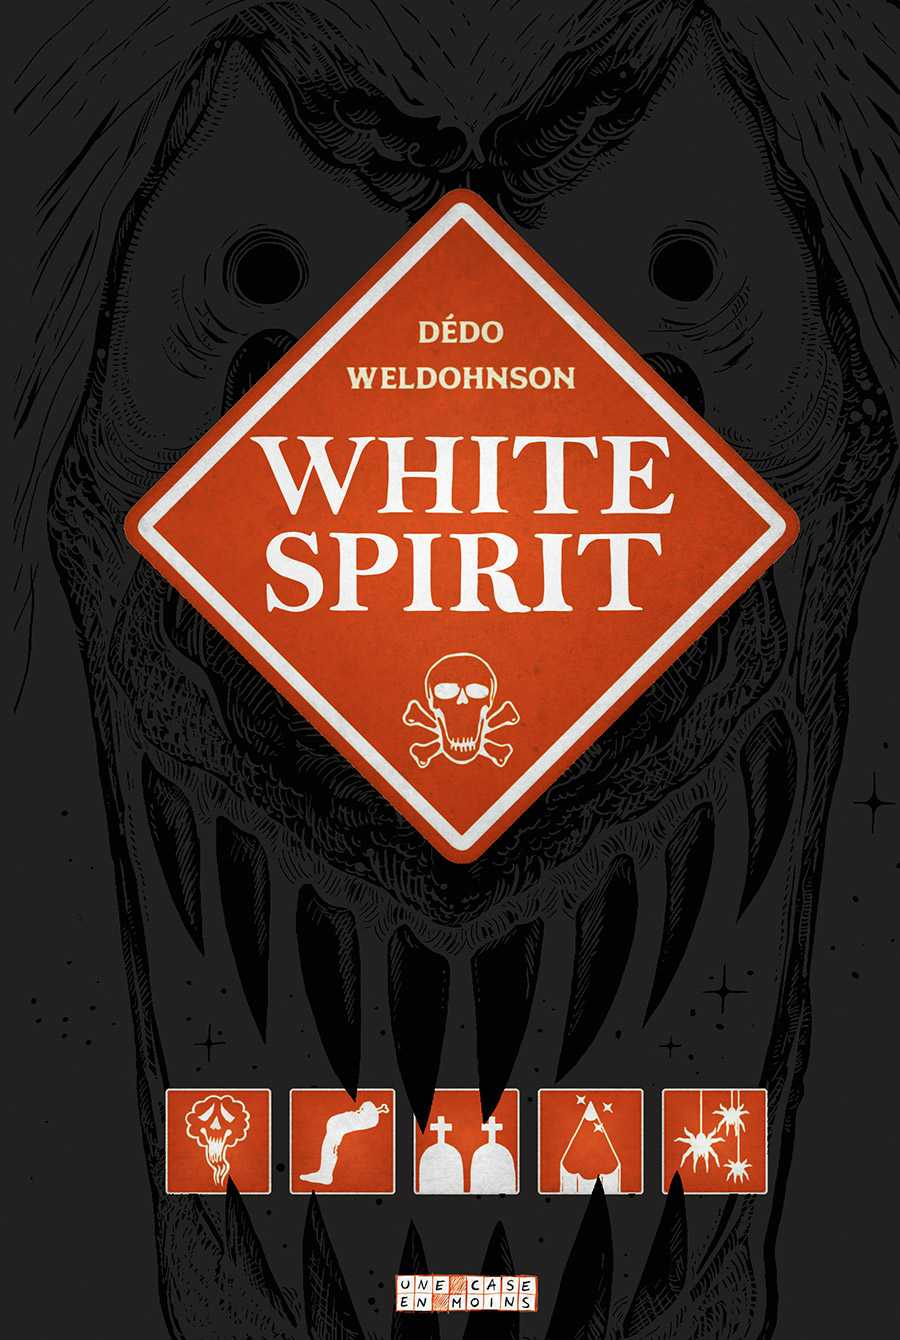 White Spirit, savoureusement abrasif